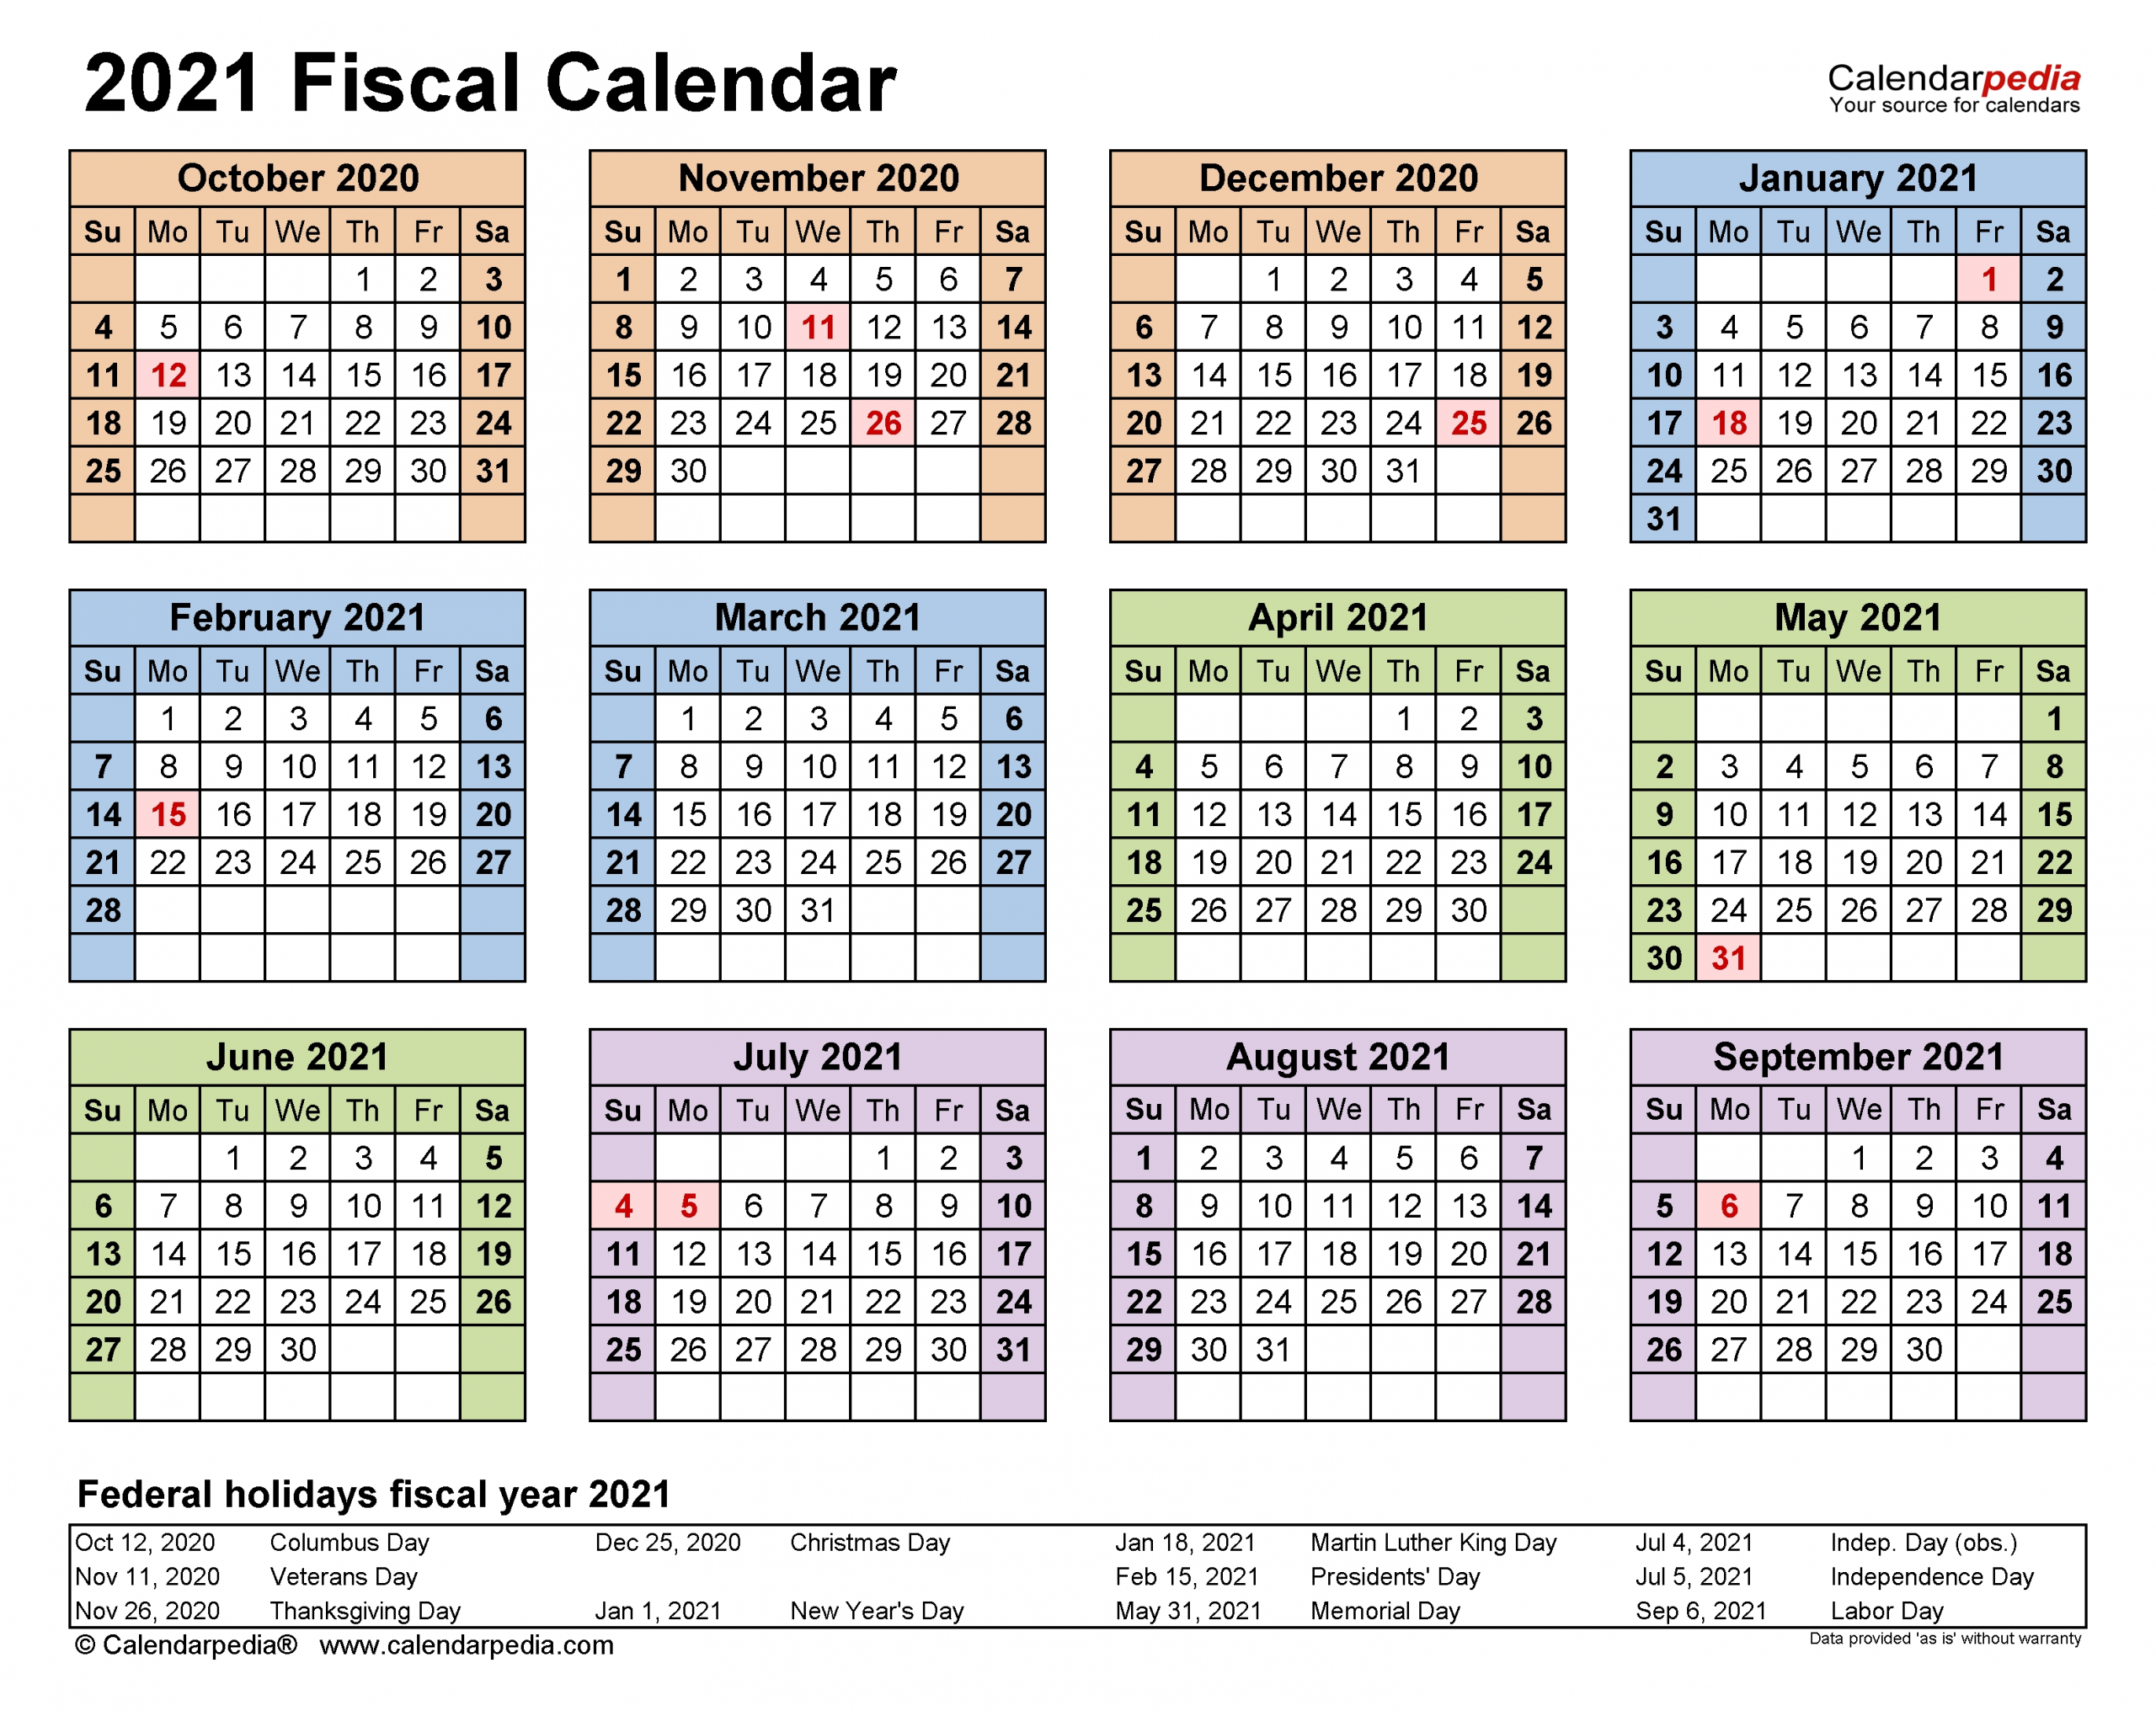 Calendrier Fiscal 2021 - Calendrier 2021